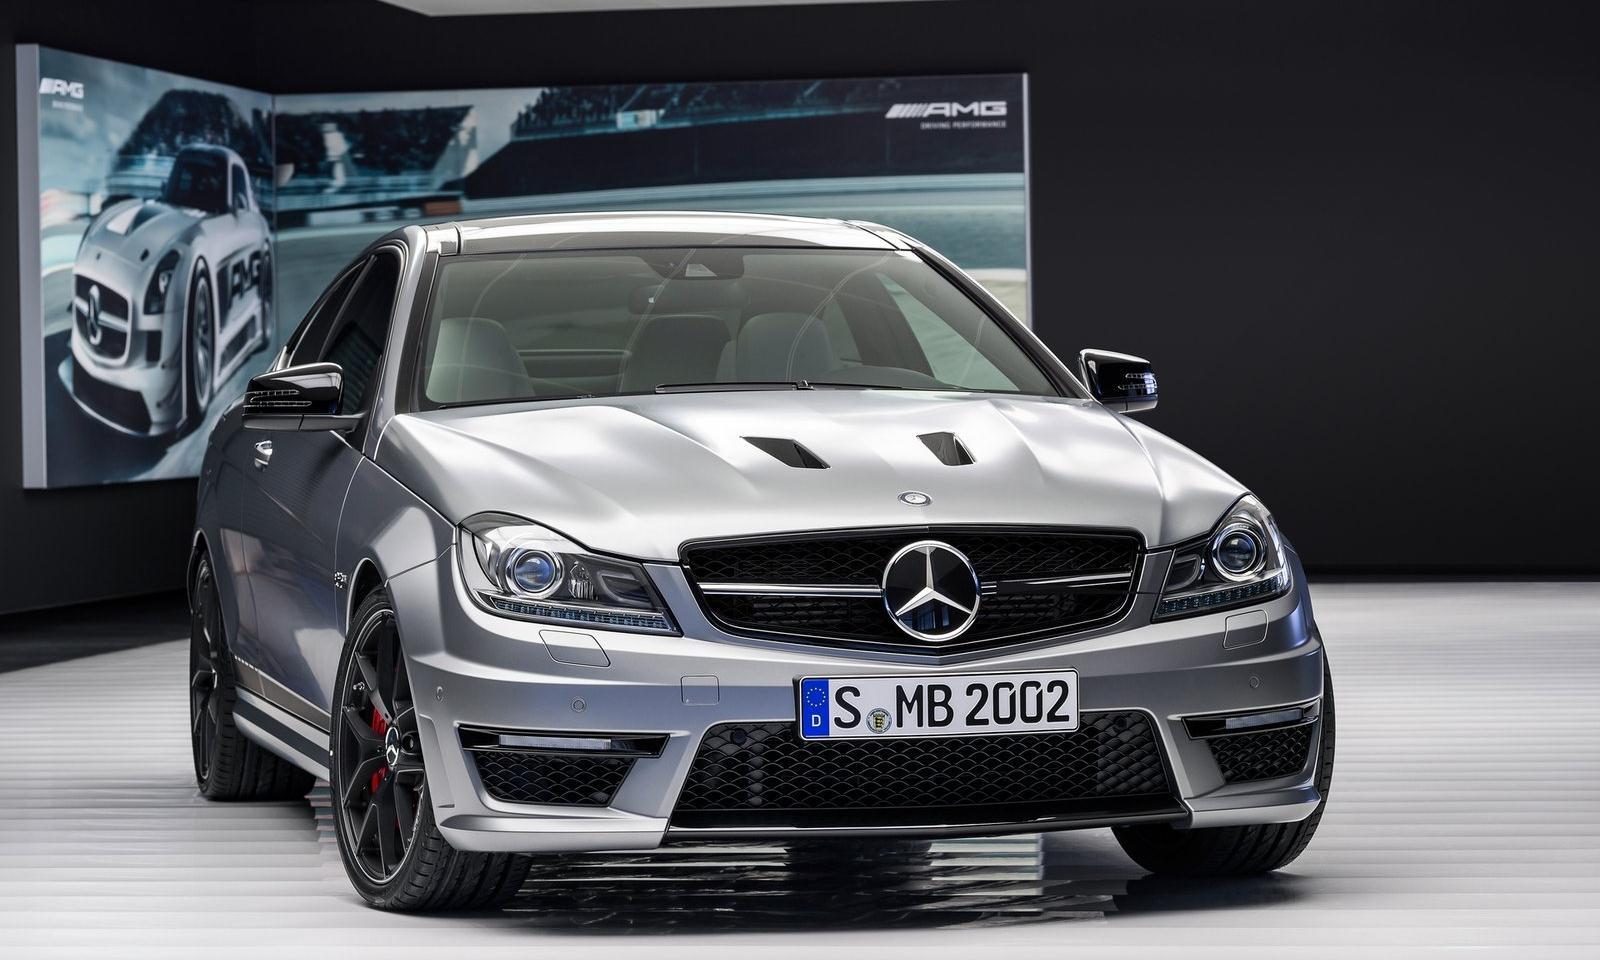 http://4.bp.blogspot.com/--YwUZ10YLJo/UQwhgGI_ekI/AAAAAAAADvE/XEpFMlvpRbM/s1600/Mercedes-Benz-C63-AMG-Edition-507-2014.jpg